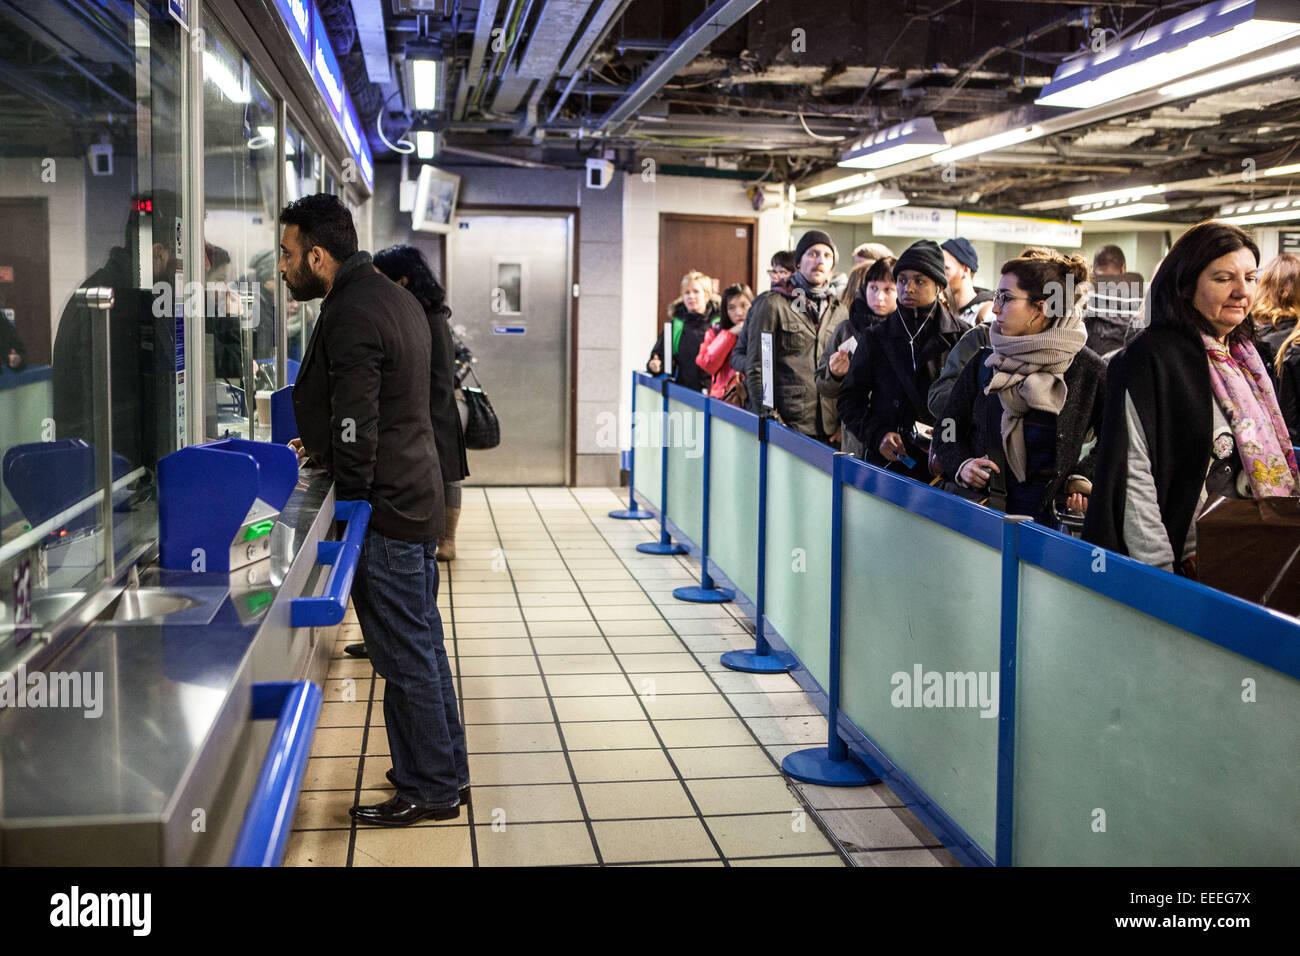 Hilfe bei einer Londoner U-Bahn Ticket office Stockbild